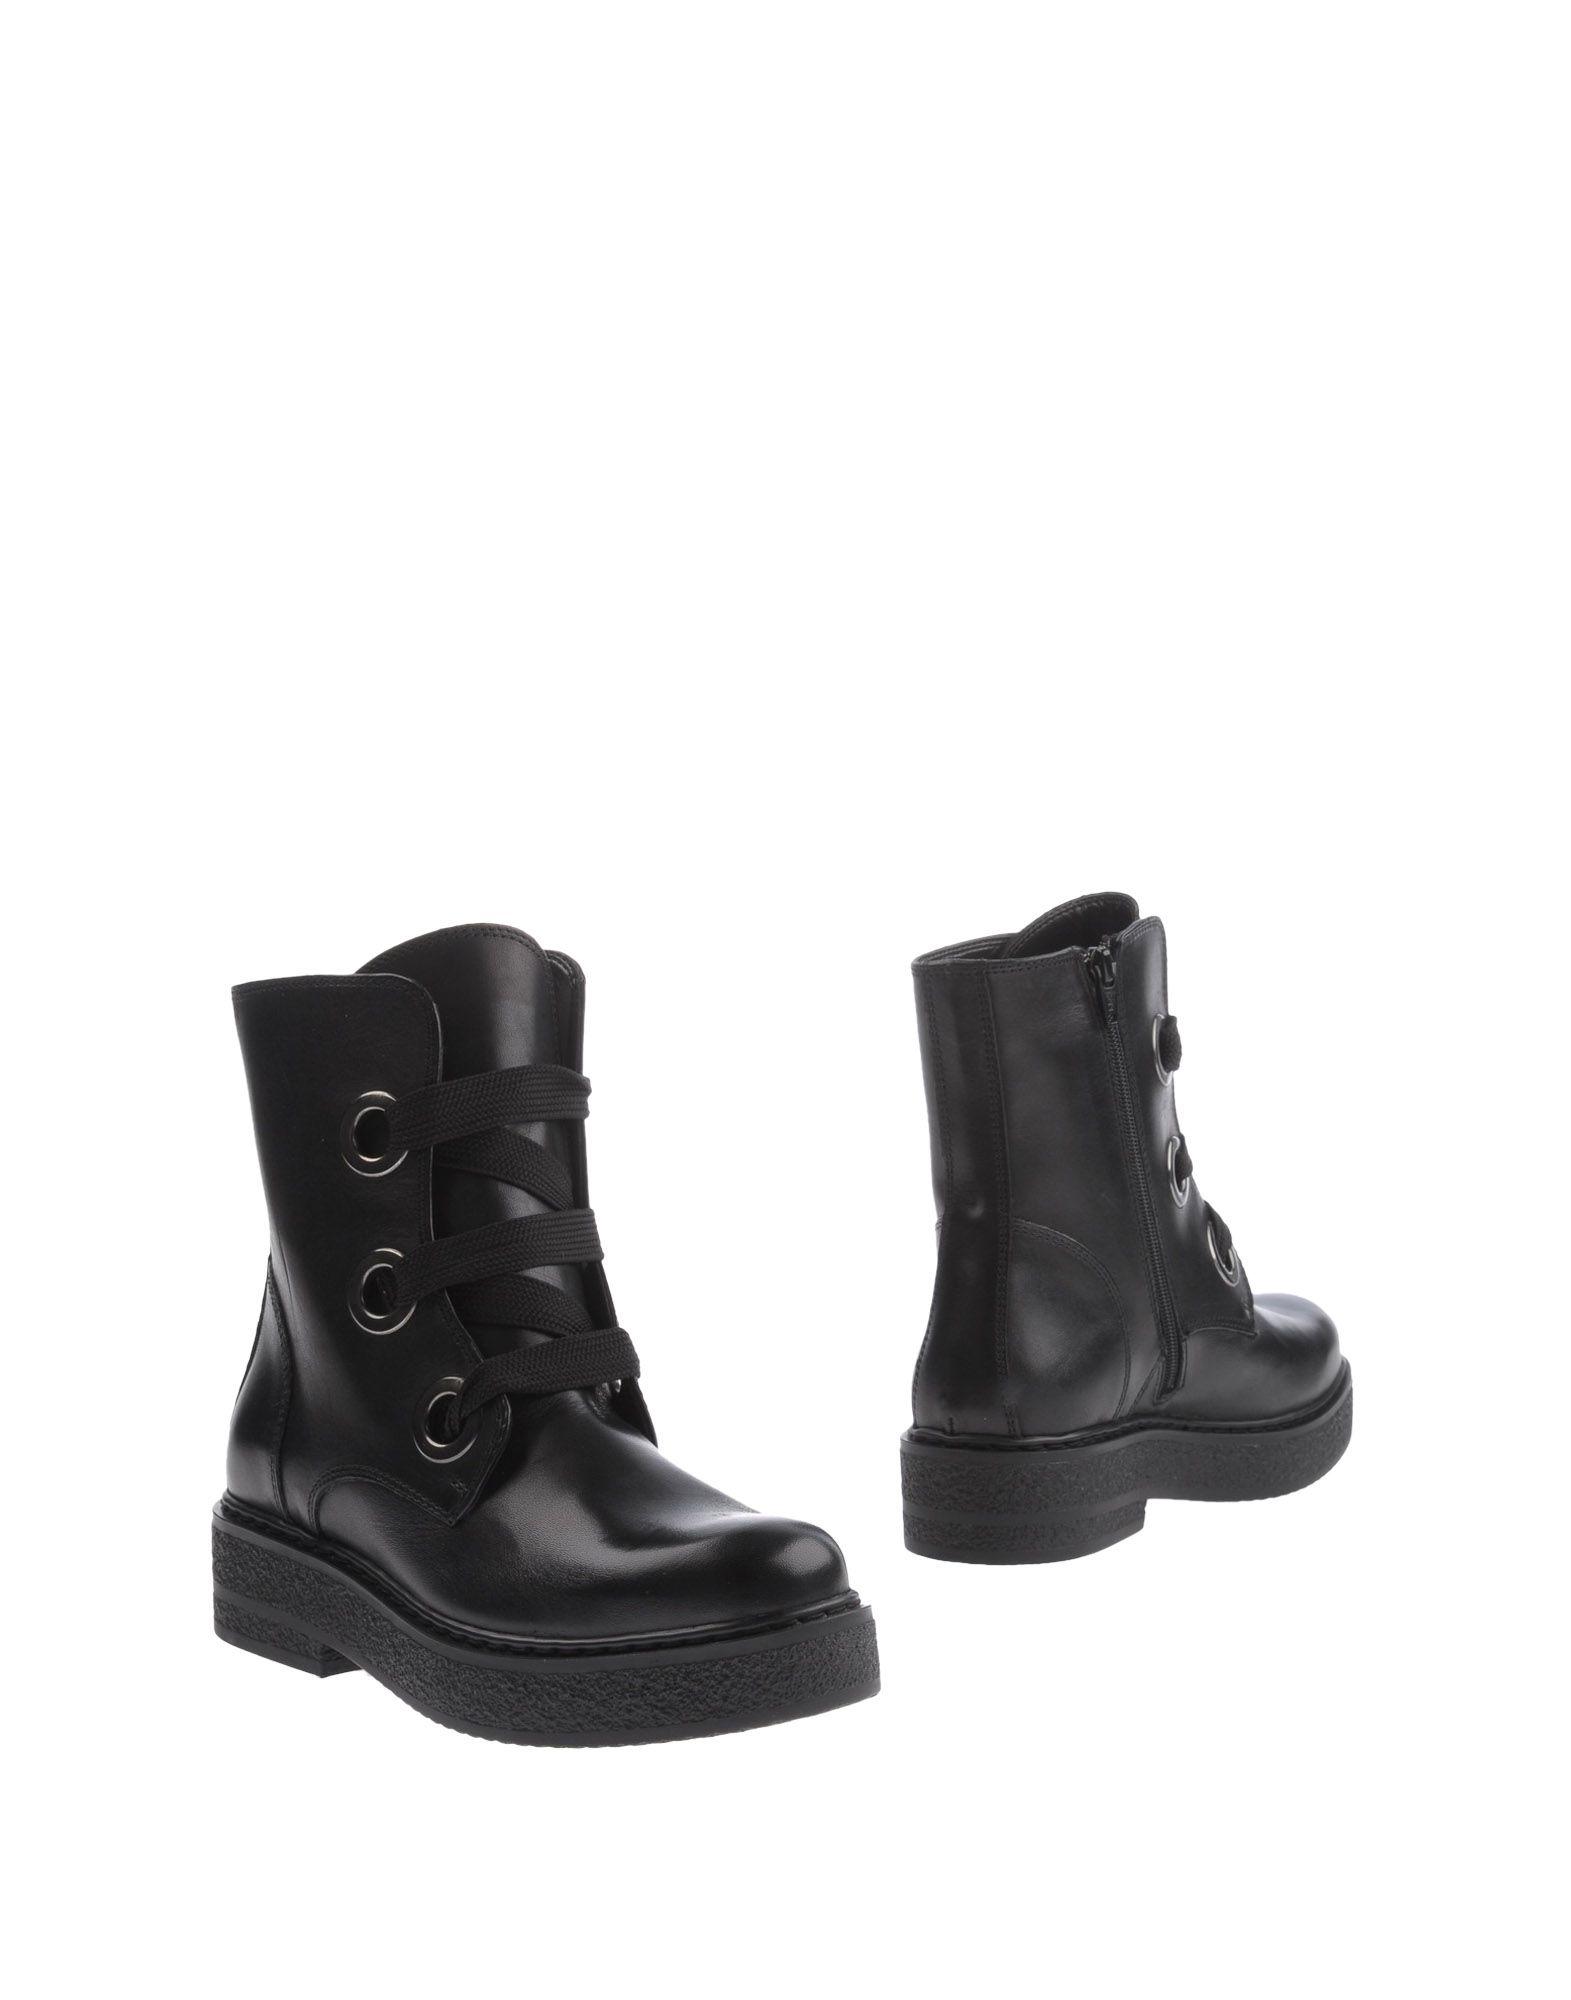 Cult 11218790PG Stiefelette Damen  11218790PG Cult Gute Qualität beliebte Schuhe 85ec3d